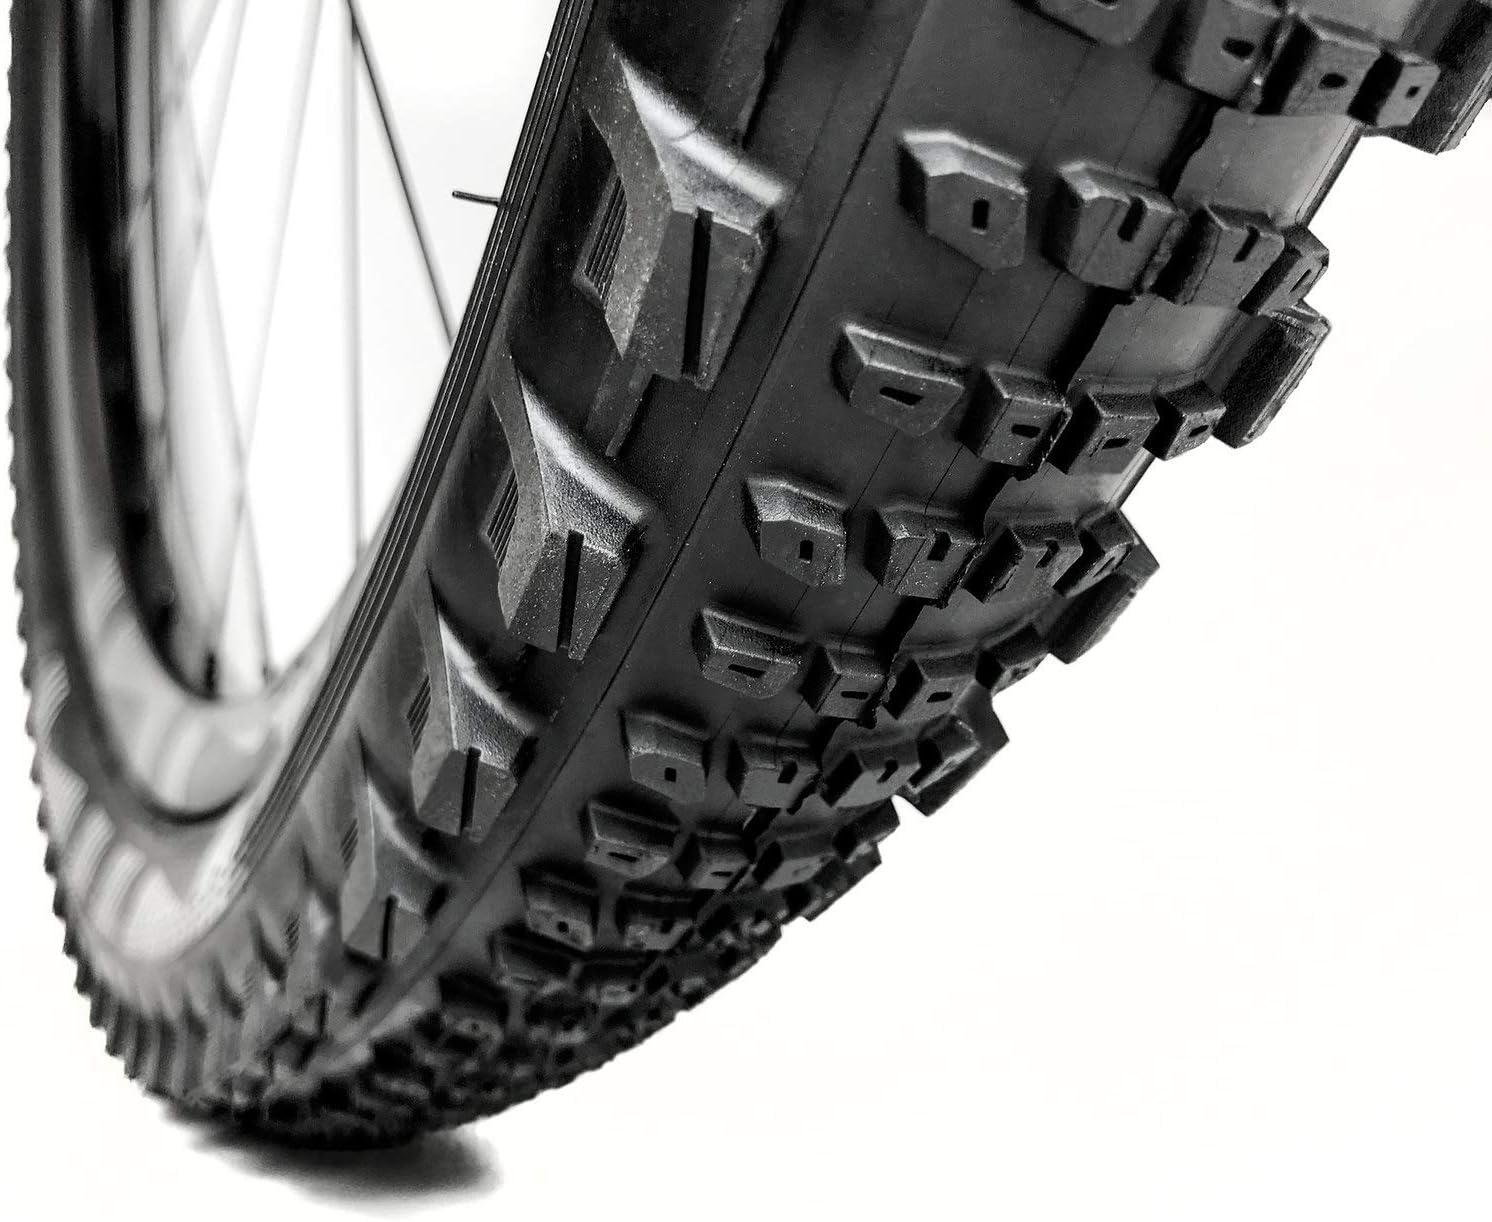 ethirteen LG1 Race Semi-Slick Tire, 27.5 x 2.35 Aramid Reinforced Race Compound